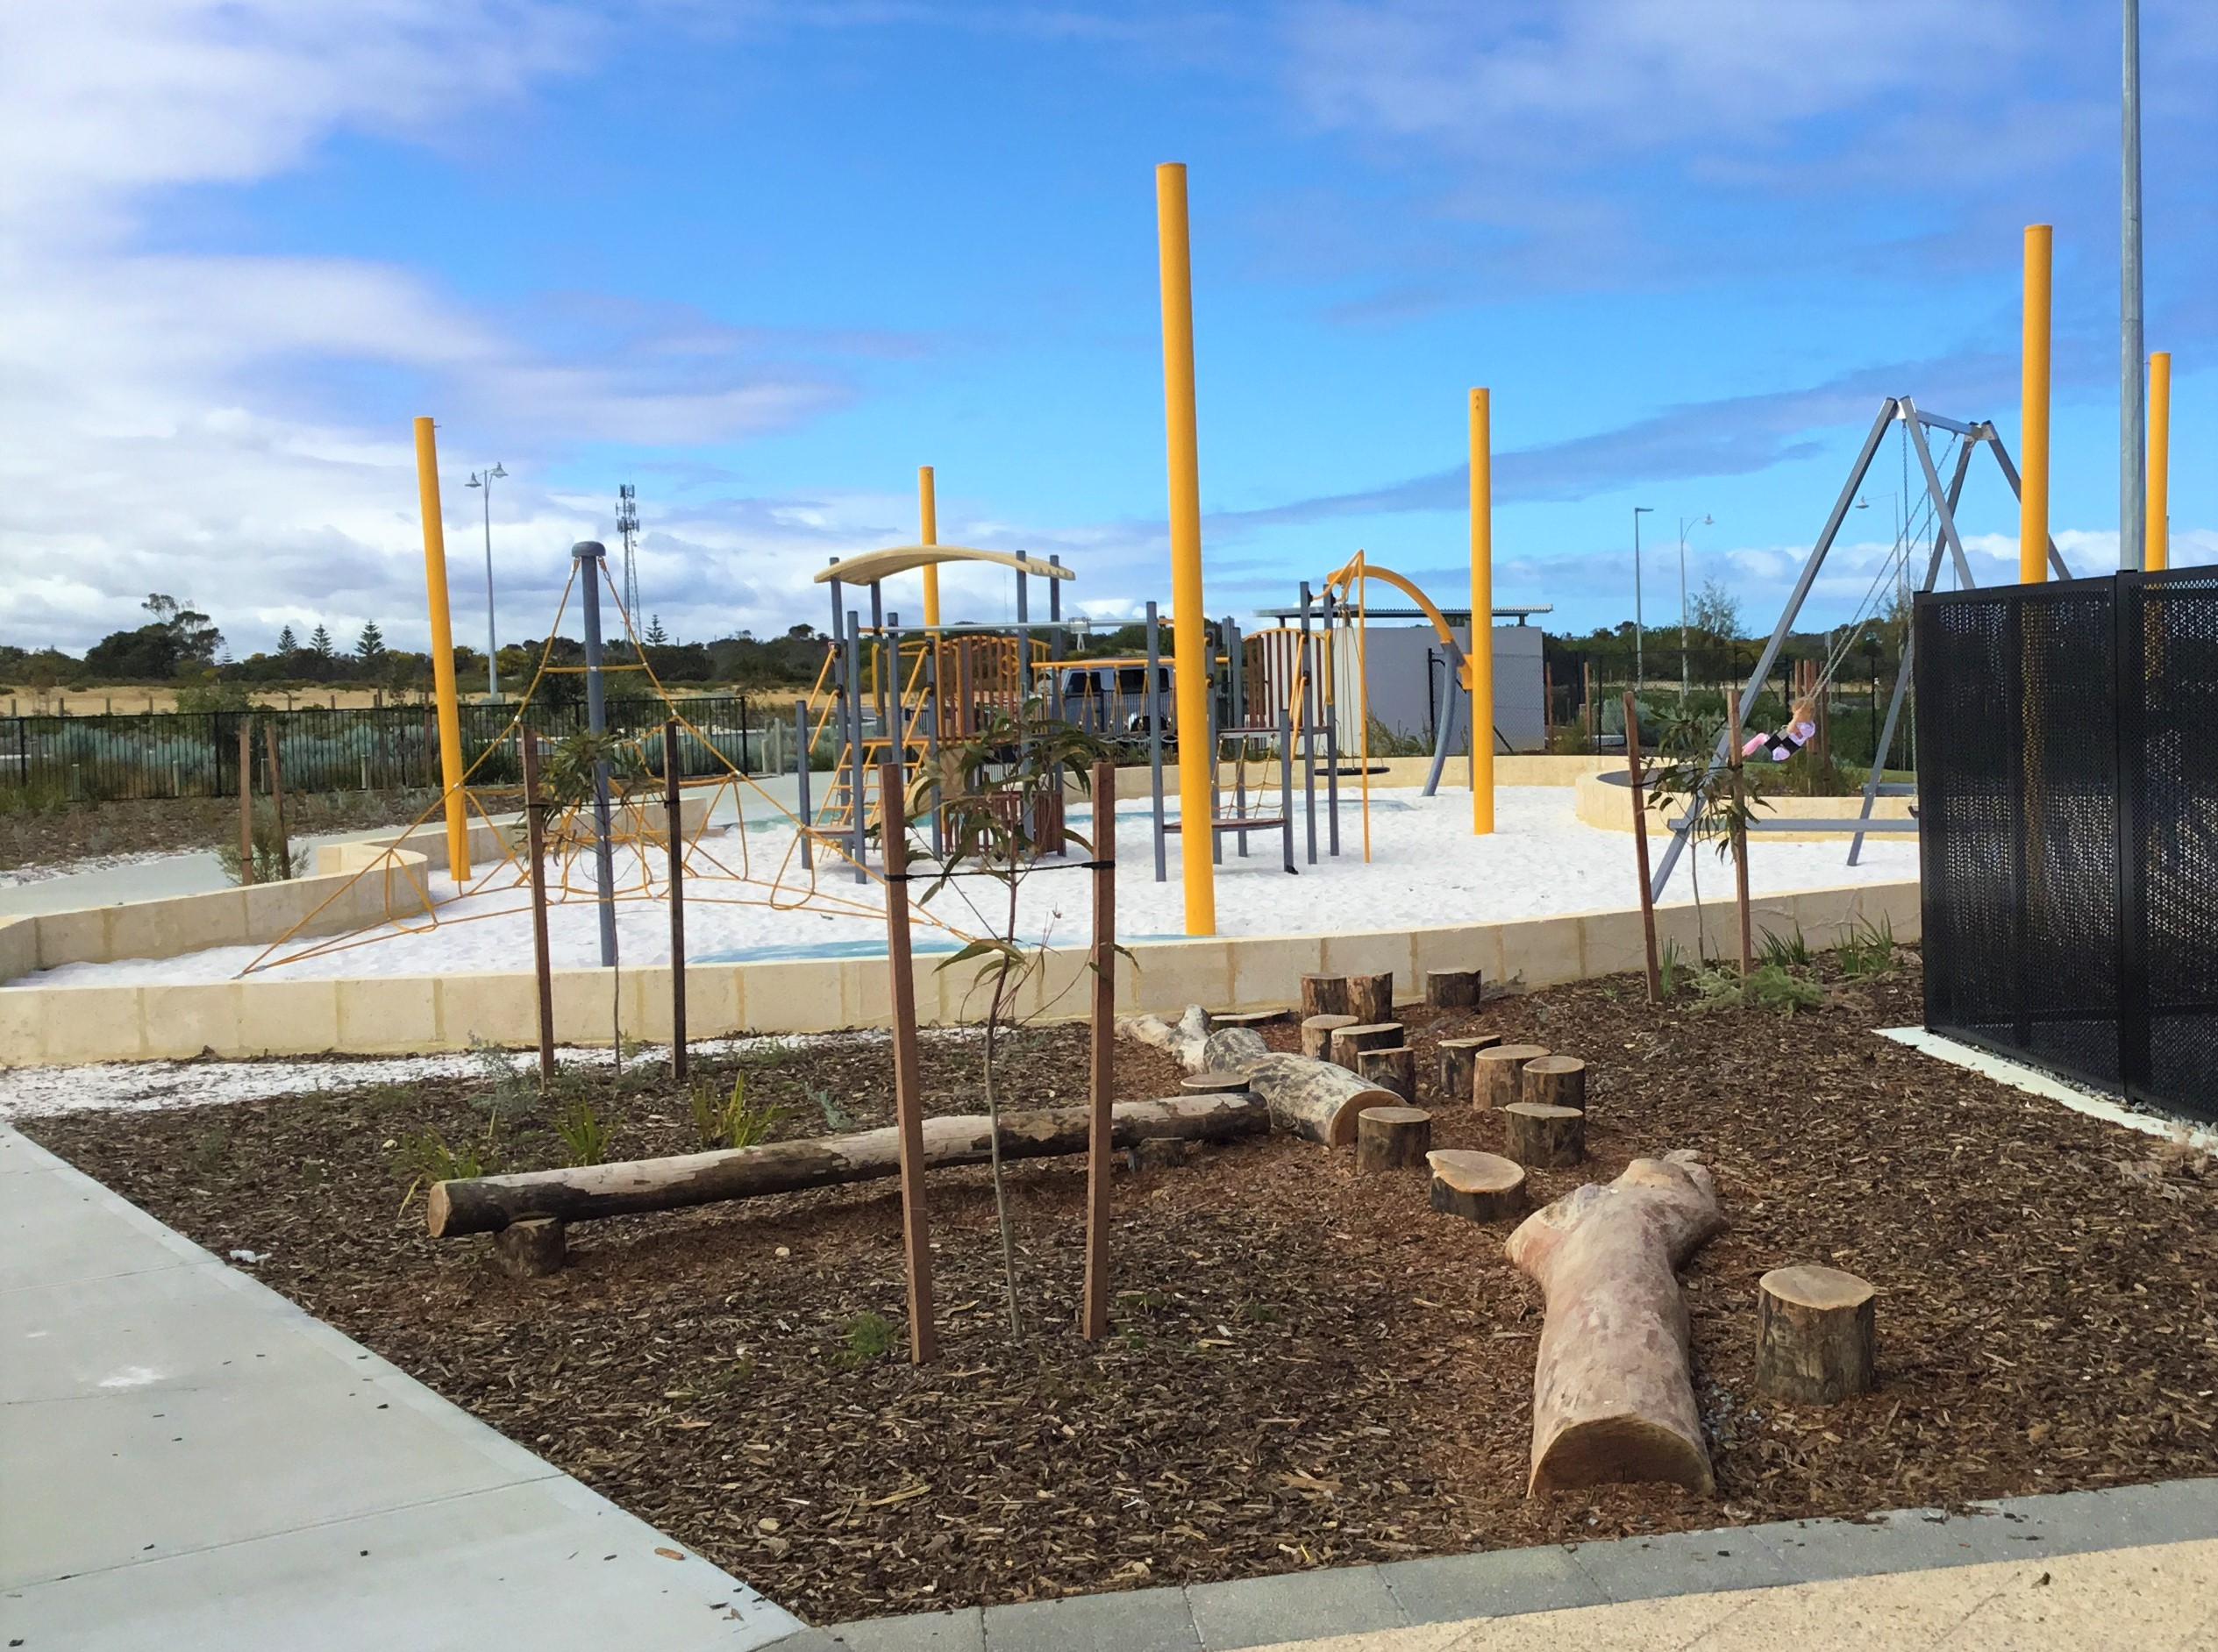 Yanchep POS - Playground